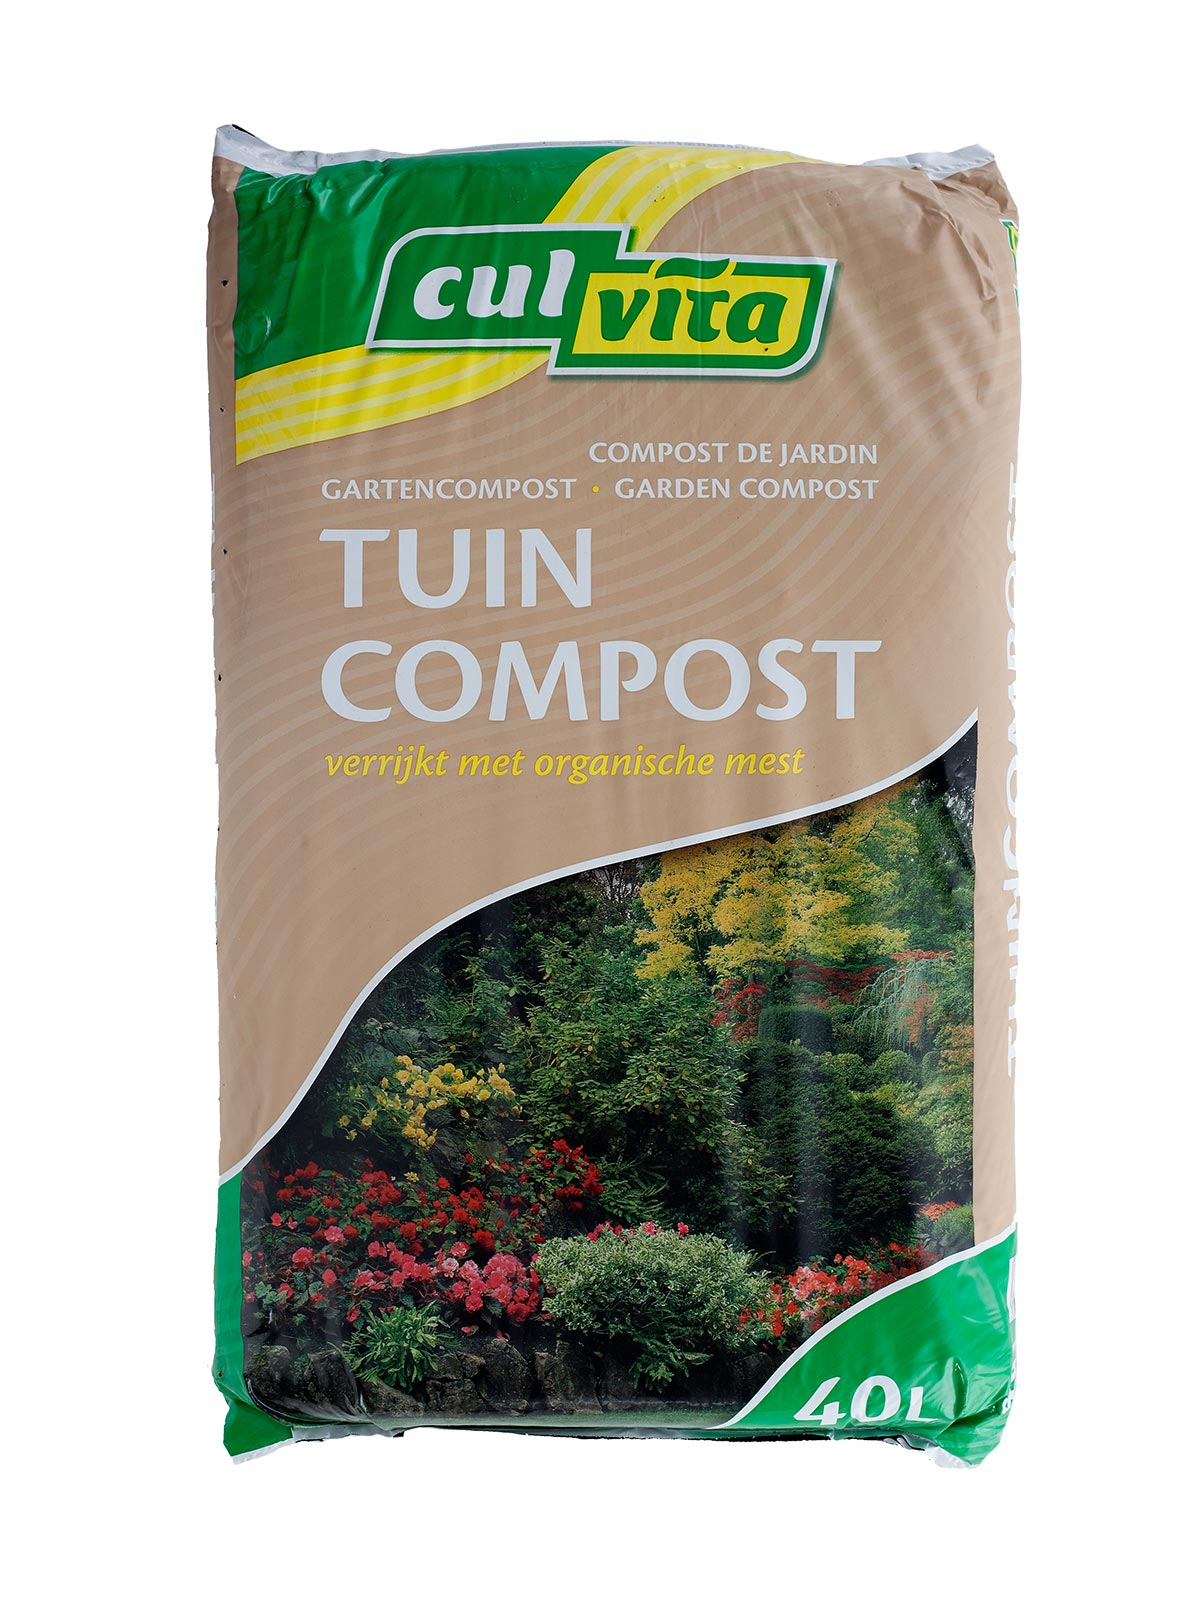 Culvita Tuincompost | Culvita.nl